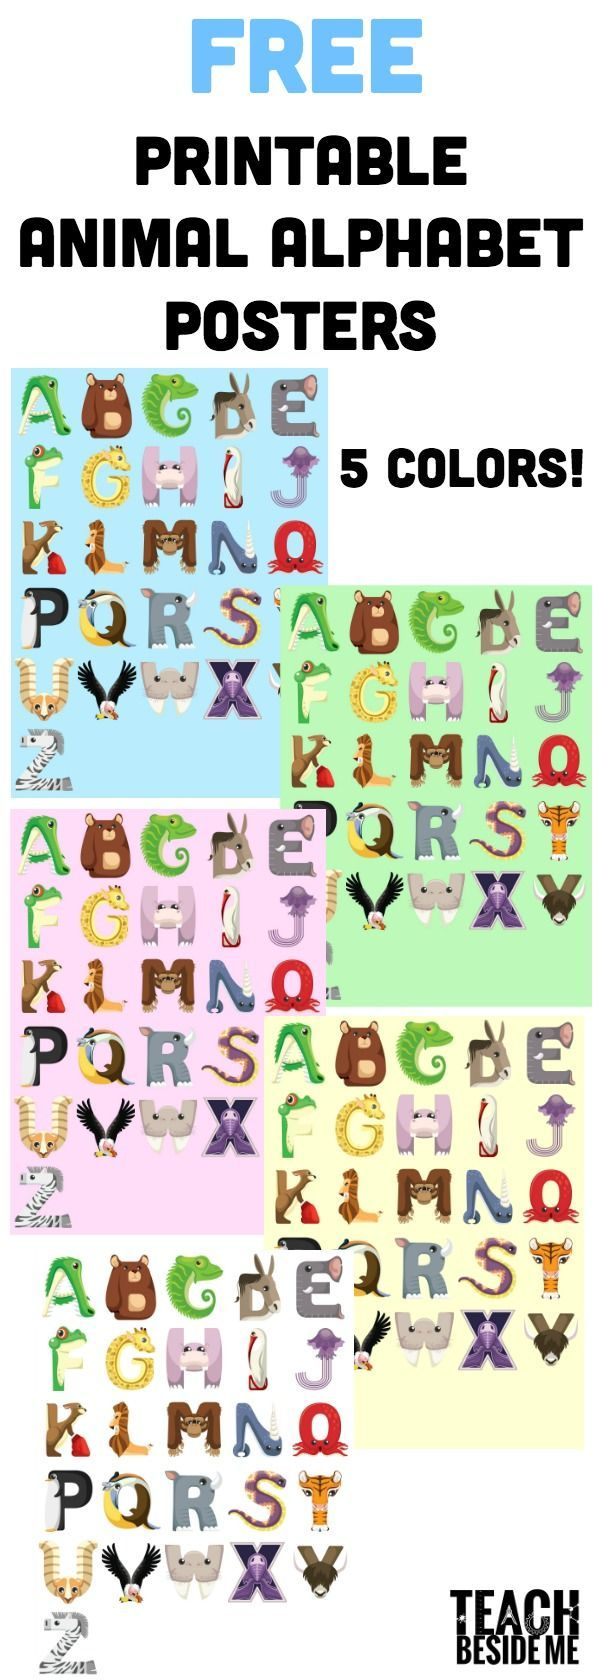 Printable Animal Alphabet Posters